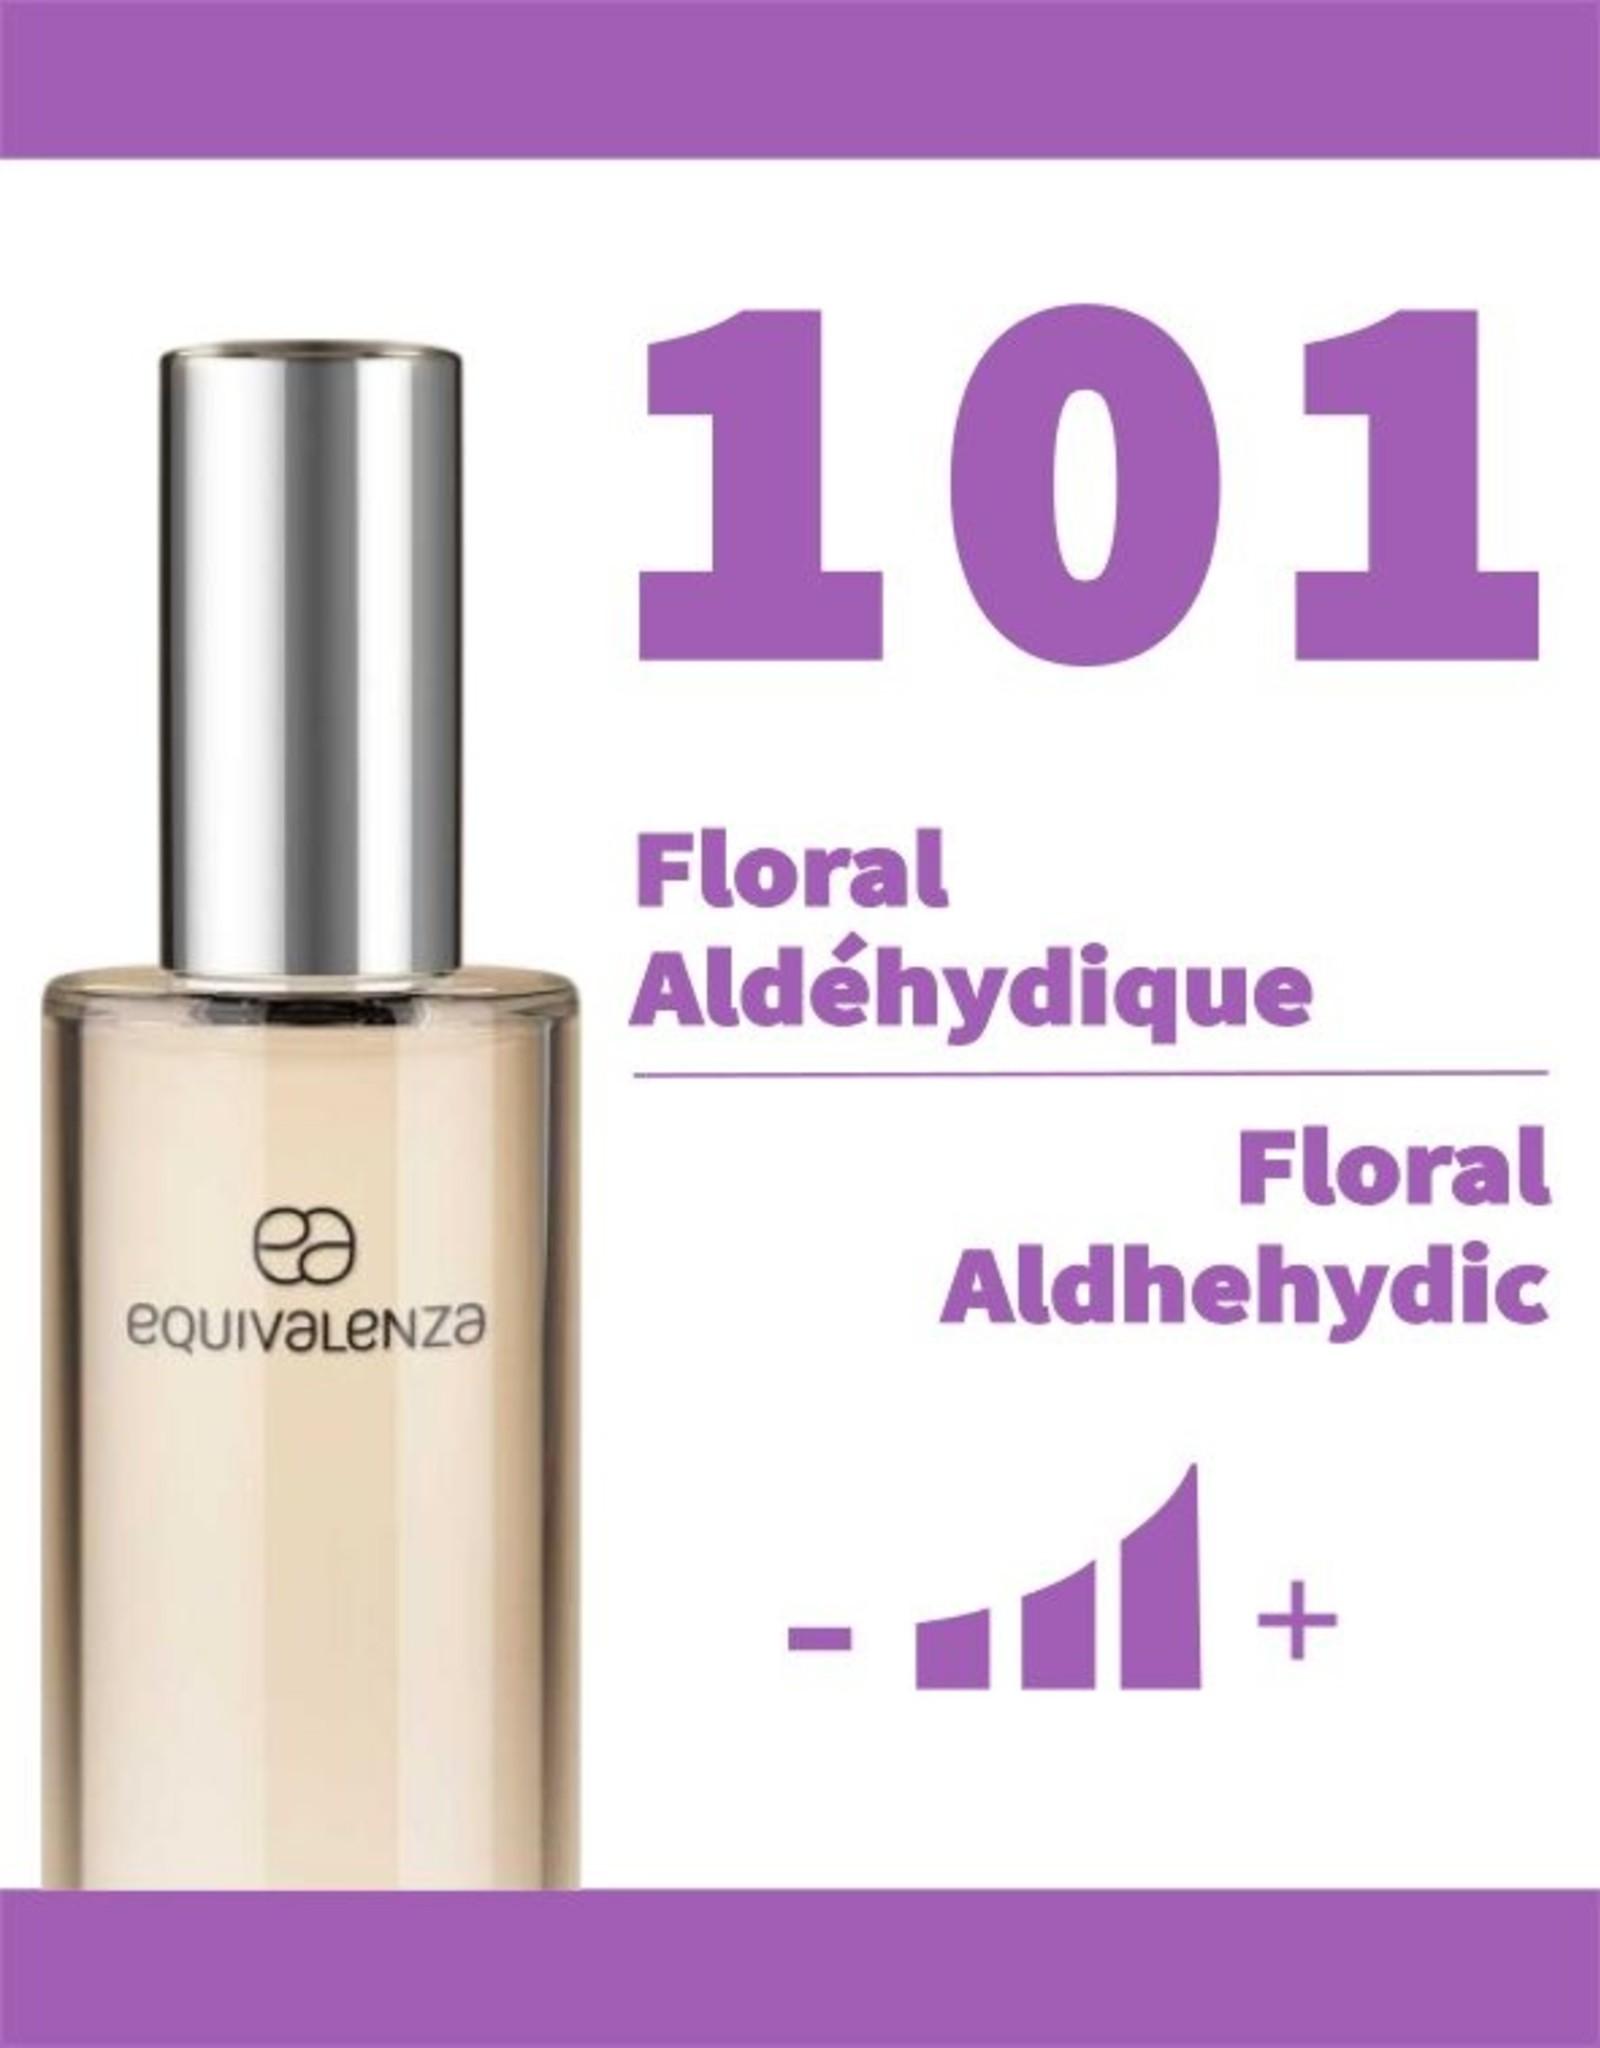 Equivalenza Floral Aldéhydique 101